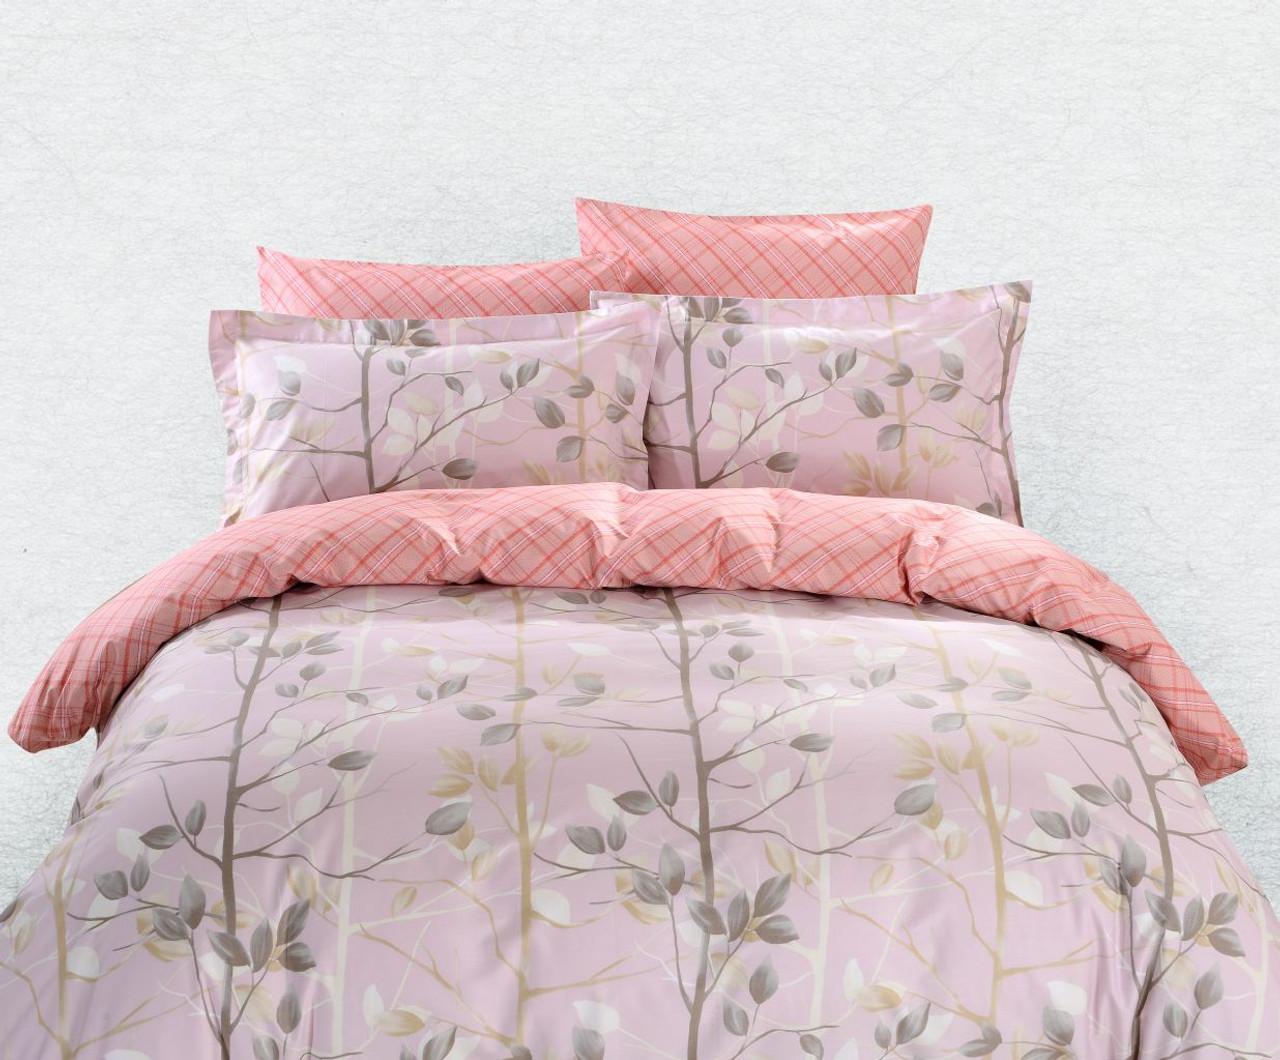 DM609Q  Bologna Luxury Bedding Set